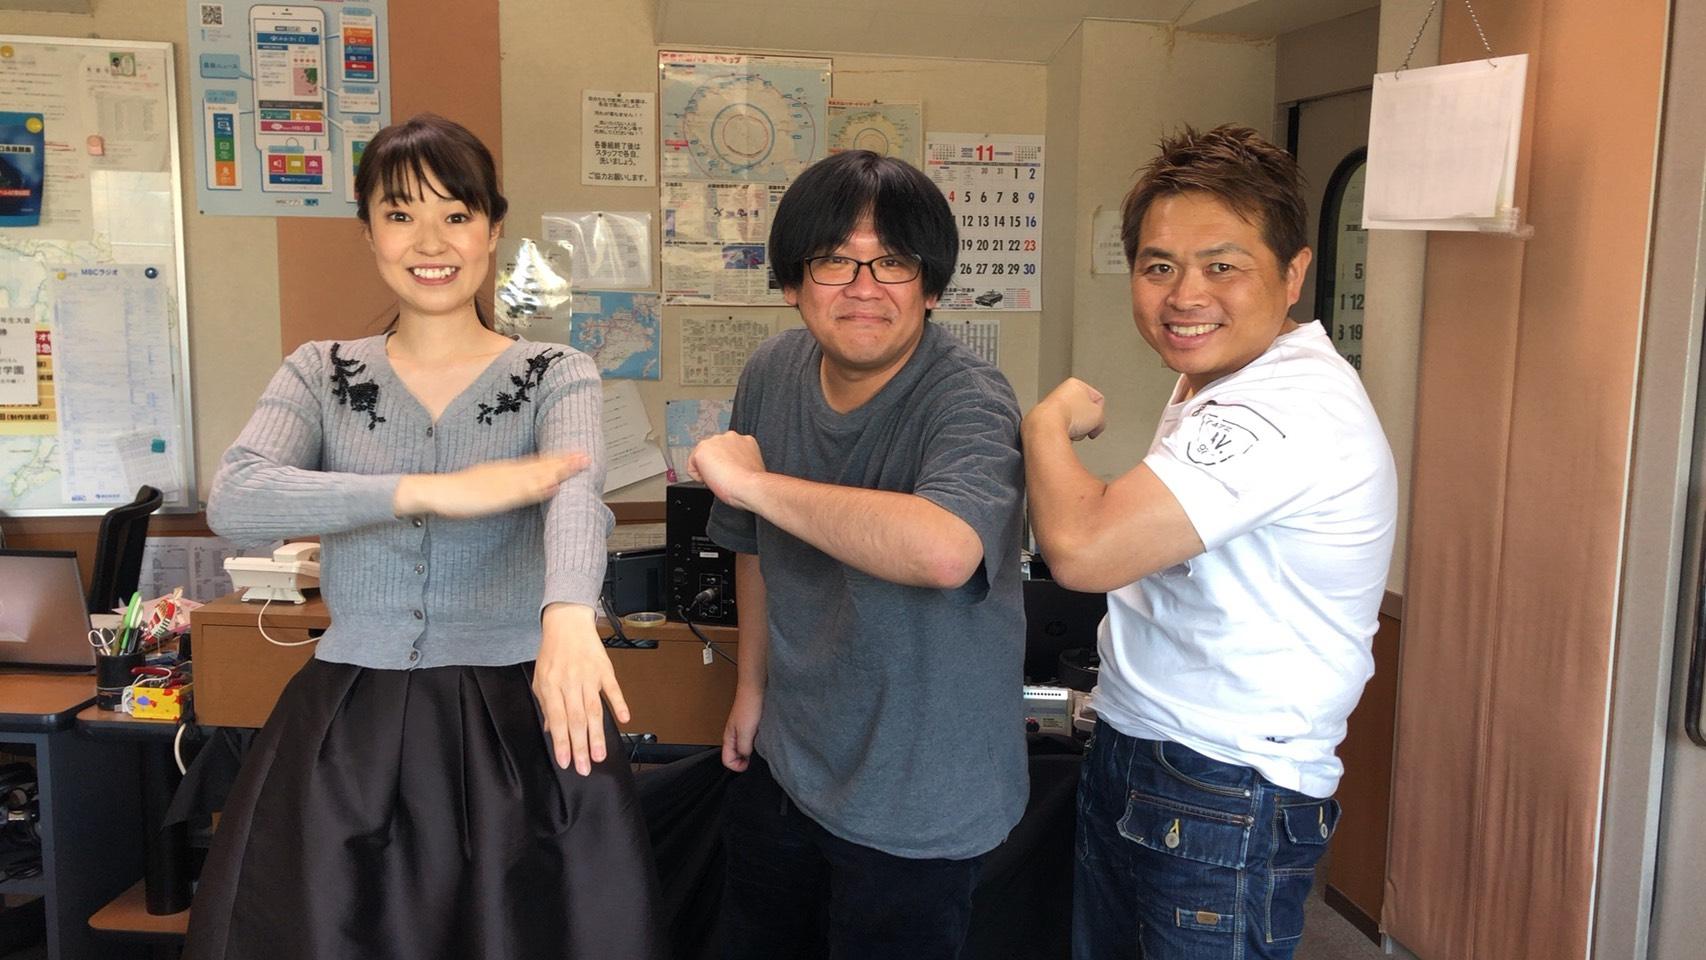 【MBCバズかご】霧島の食を世界へ!「霧島ガストロノミー」の話【2019.11.9】